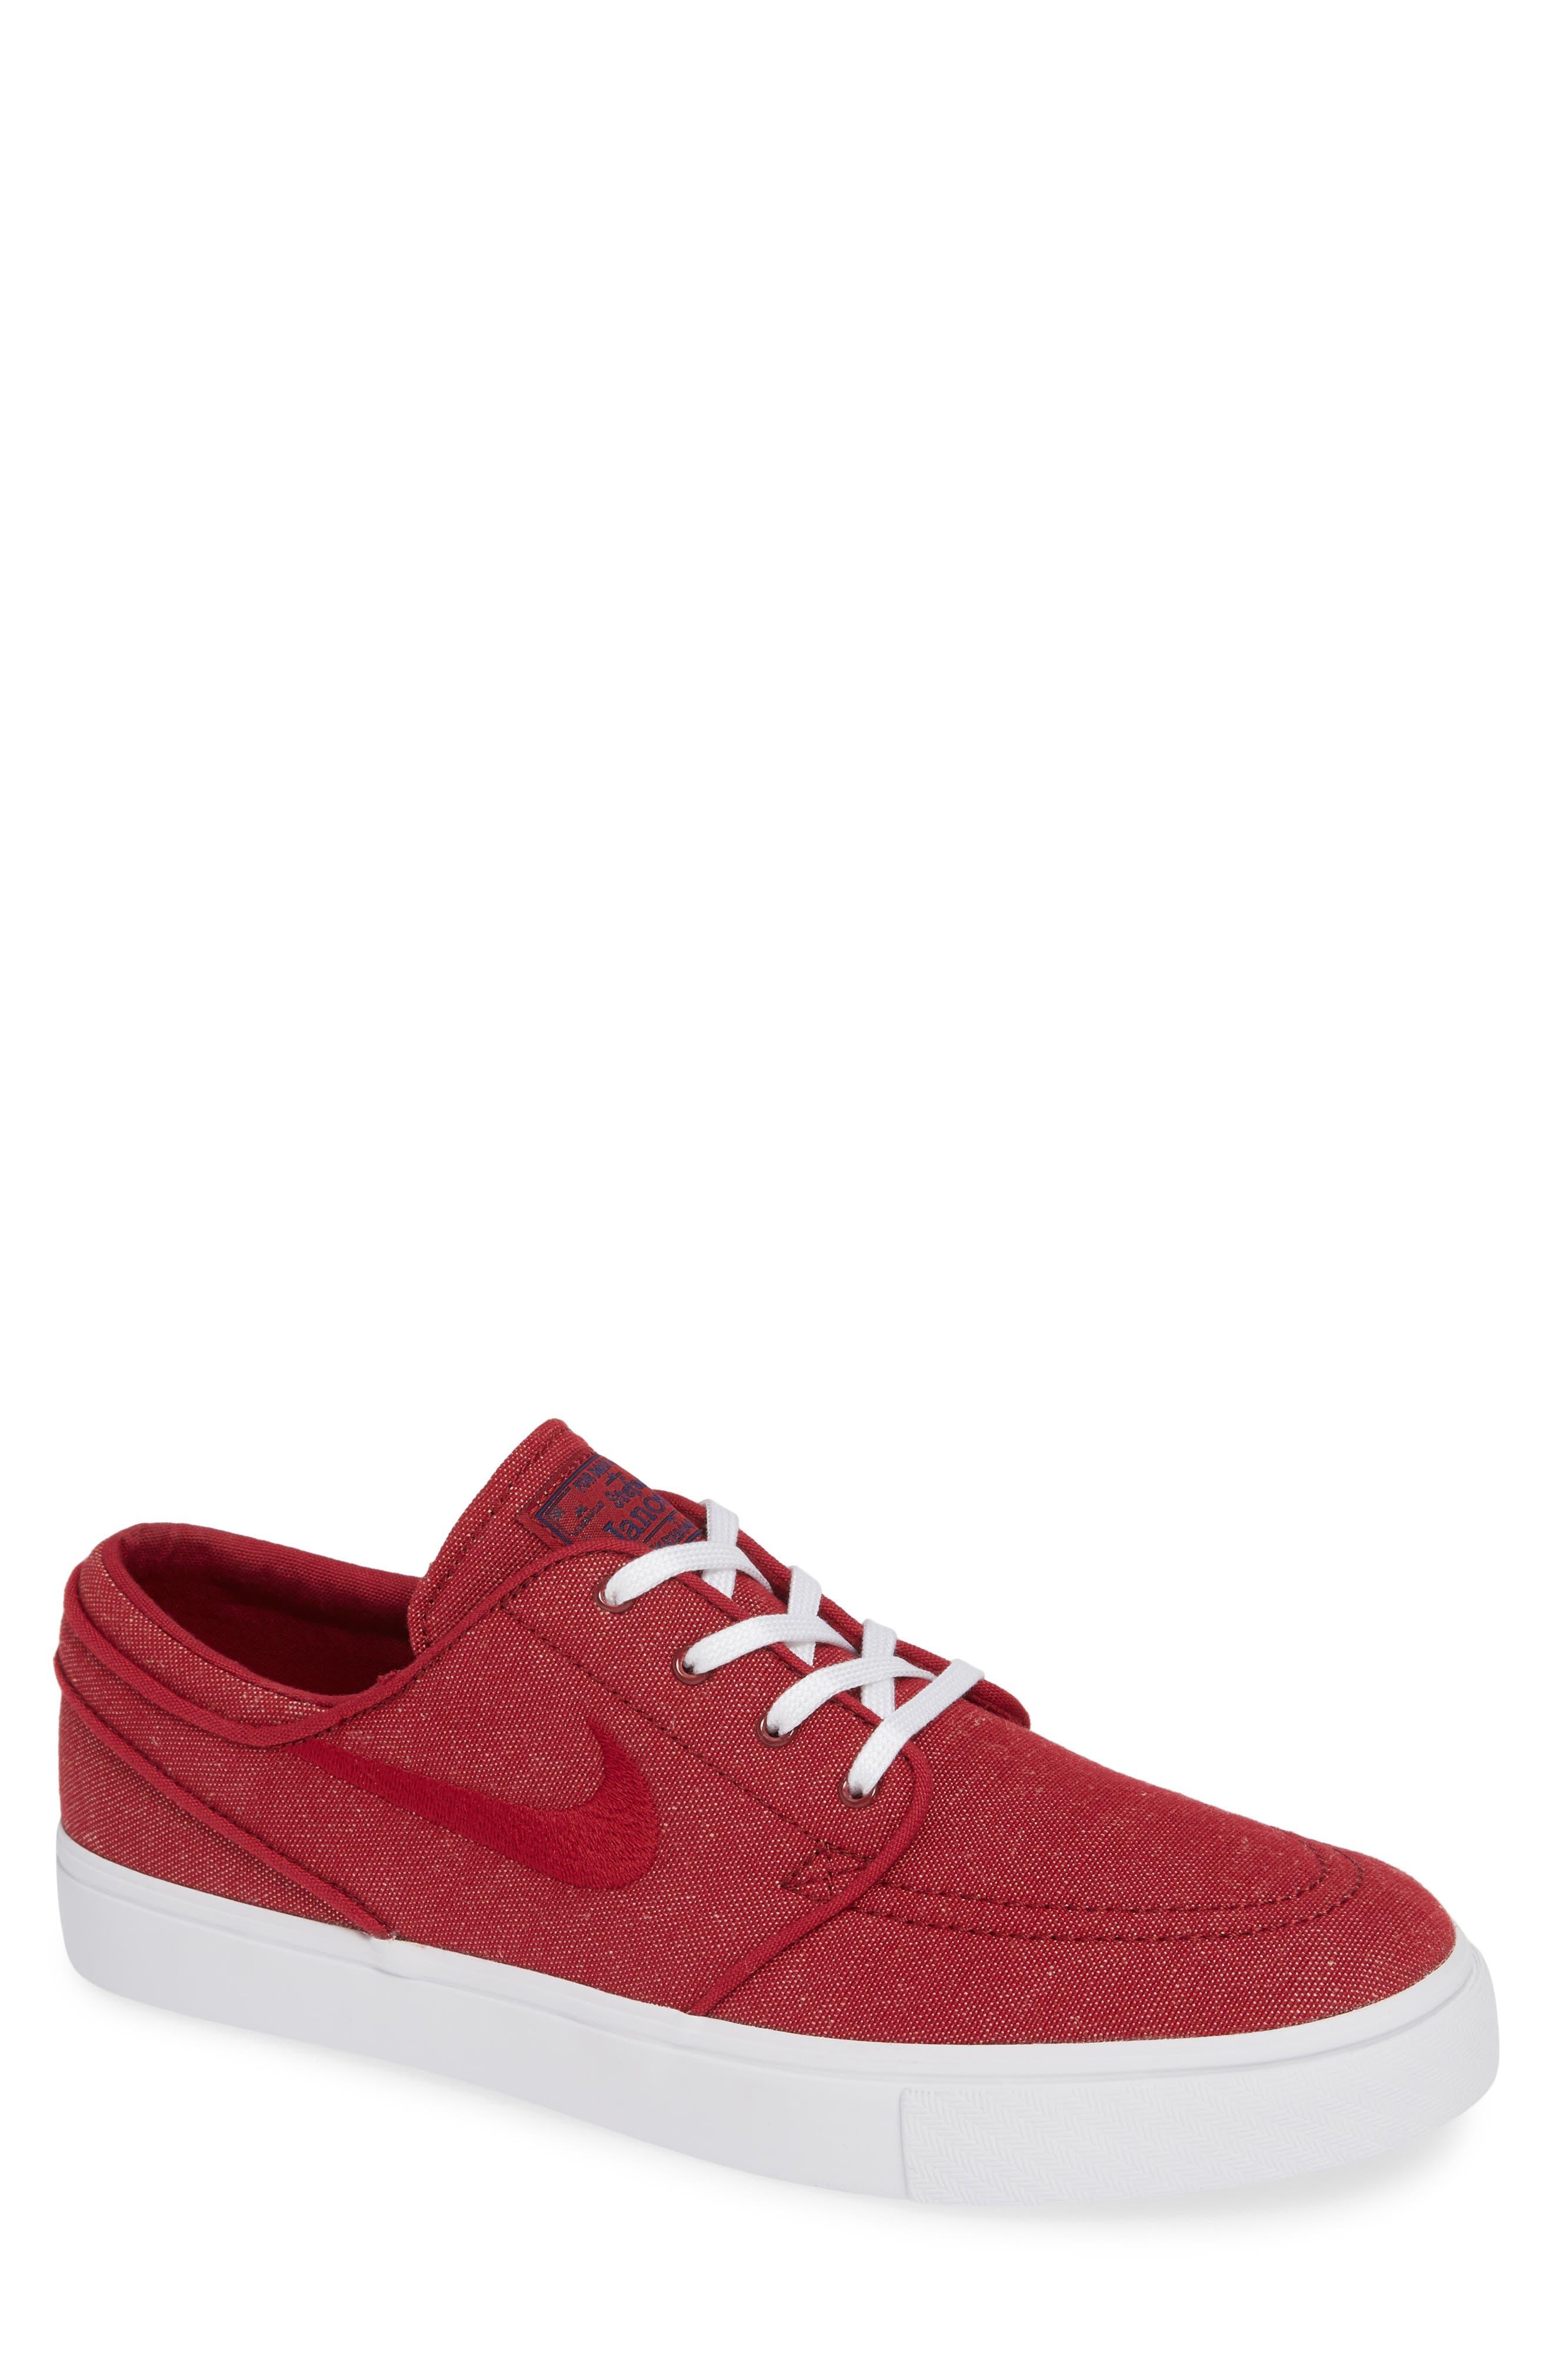 Zoom - Stefan Janoski SB Canvas Skate Shoe,                             Main thumbnail 1, color,                             Red Crush/ White